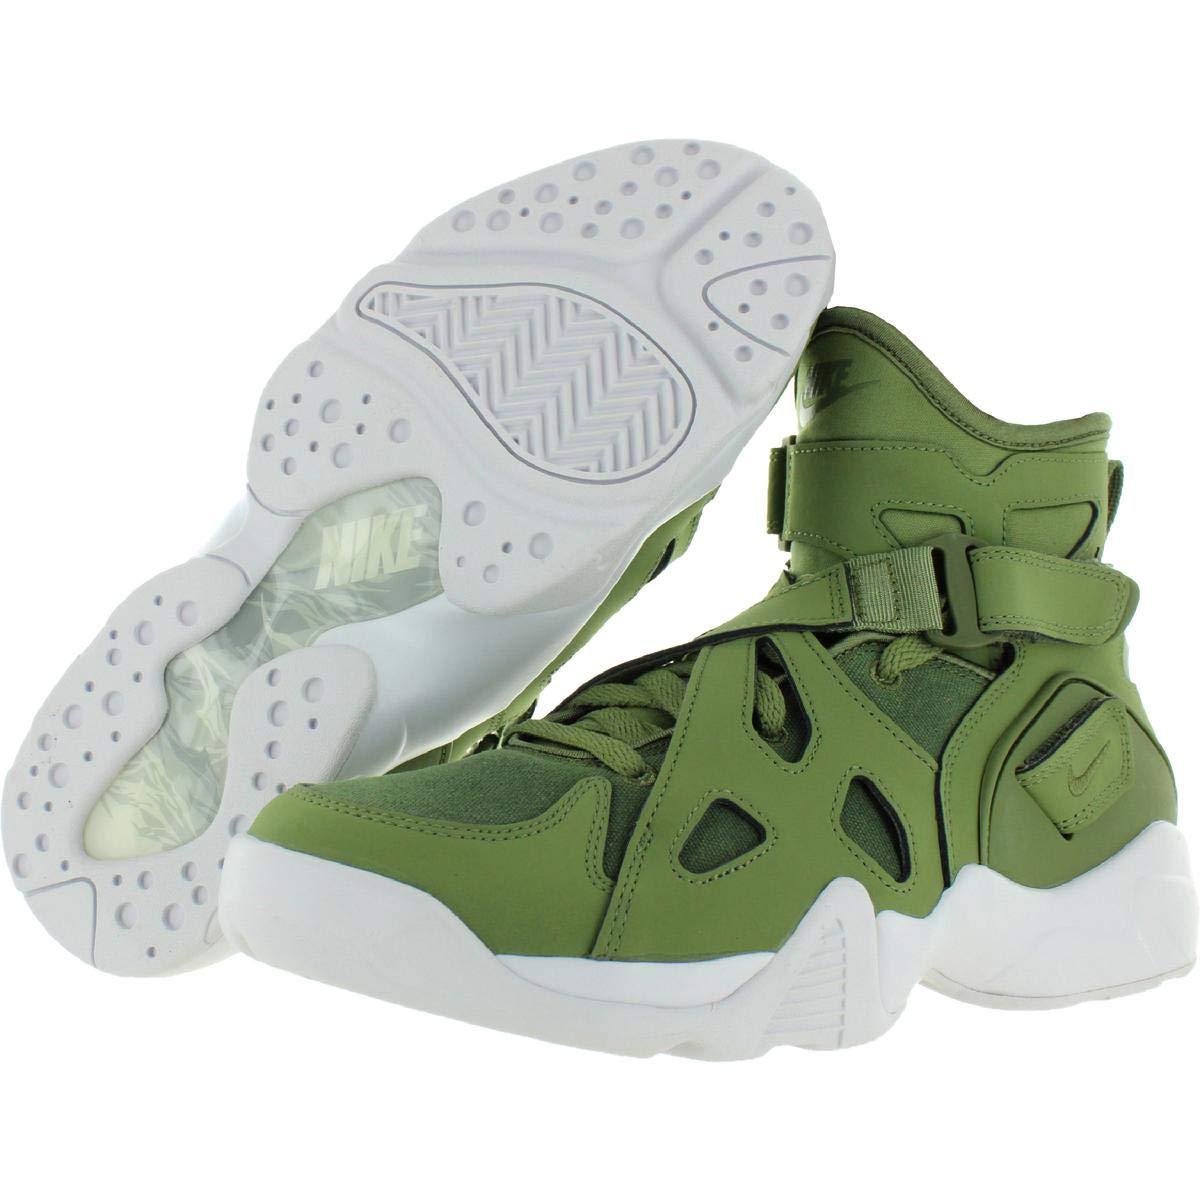 Jugando ajedrez trimestre bancarrota  Amazon.com | Nike Men's Air Max Unlimited Basketball Shoes Palm Green (8) |  Shoes